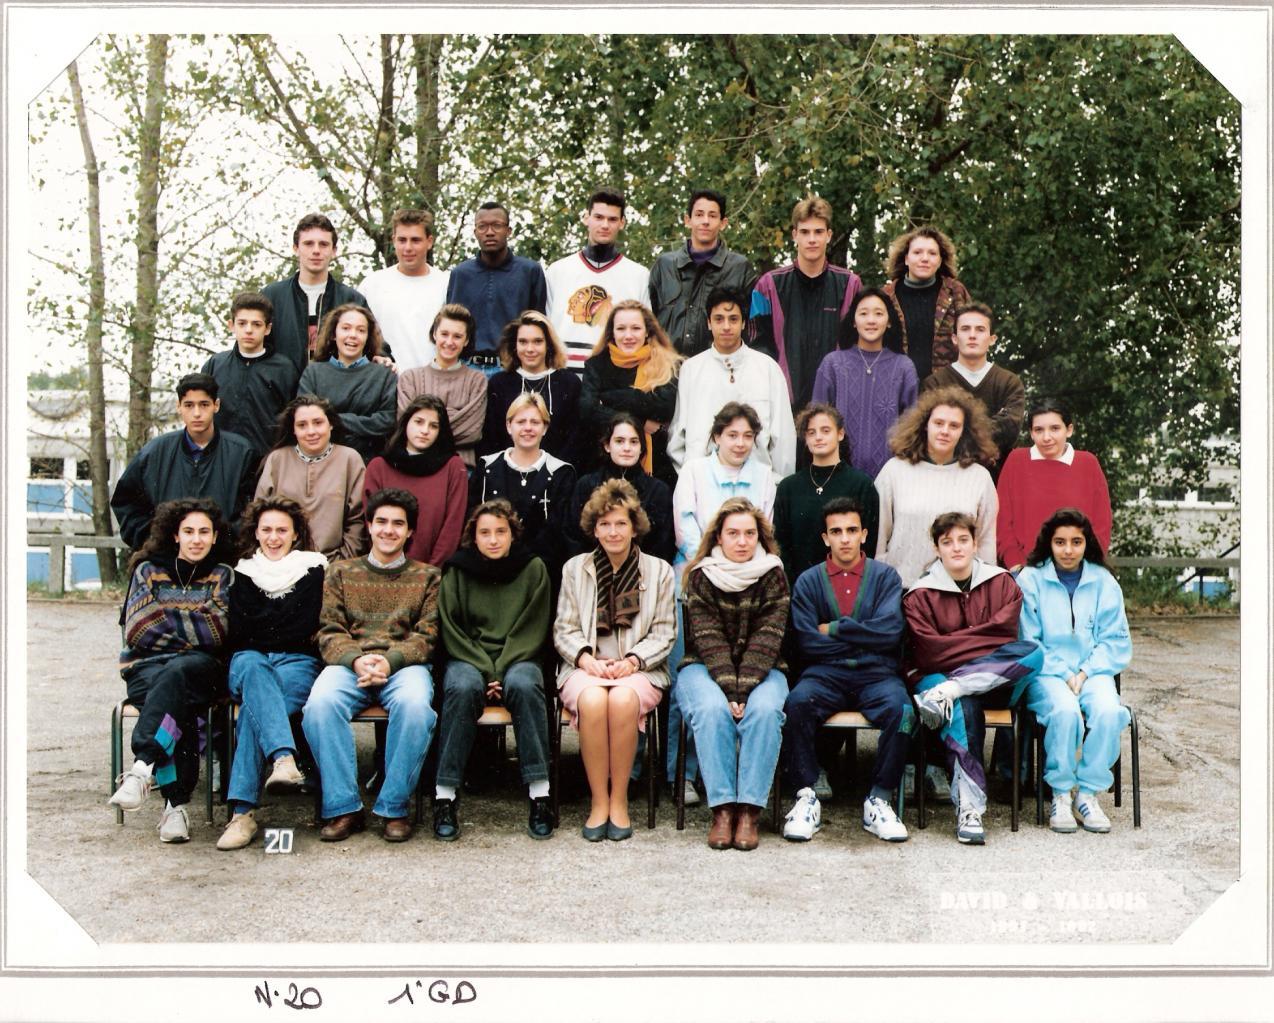 1992 - 1GD